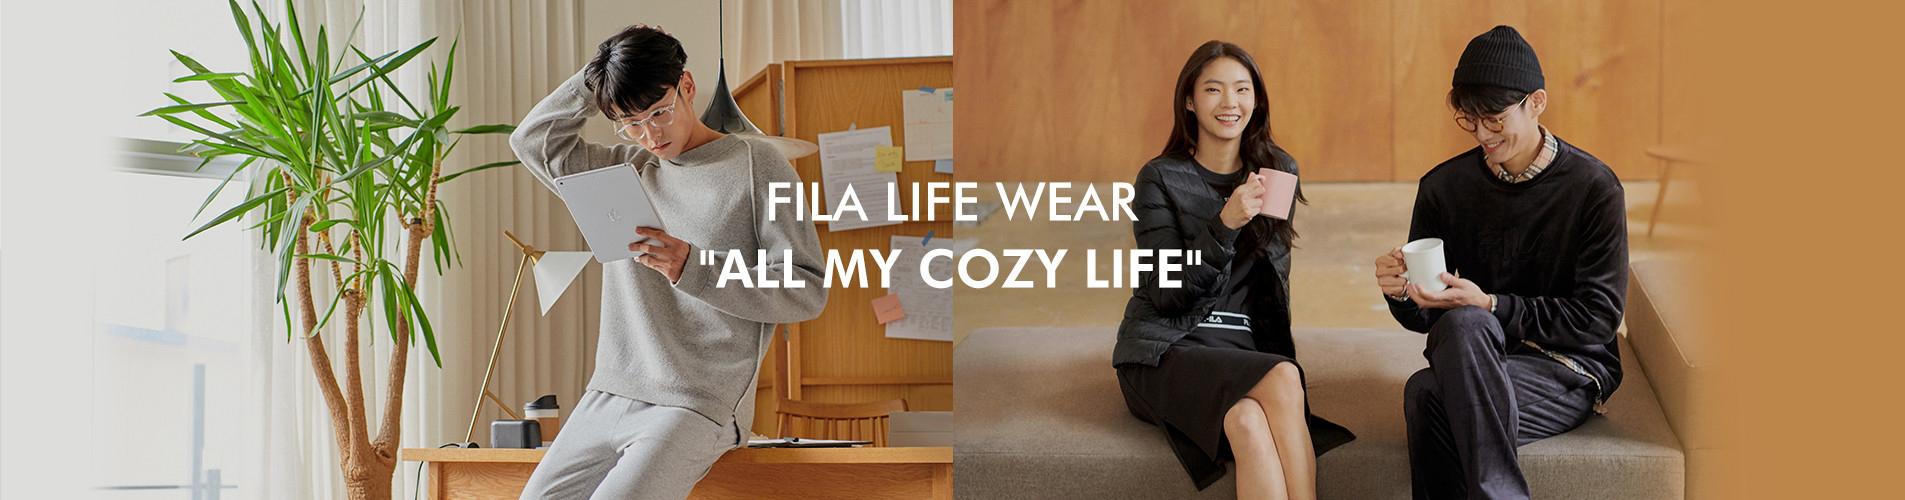 FILA LIFE WEAR ALL MY COZY LIFE